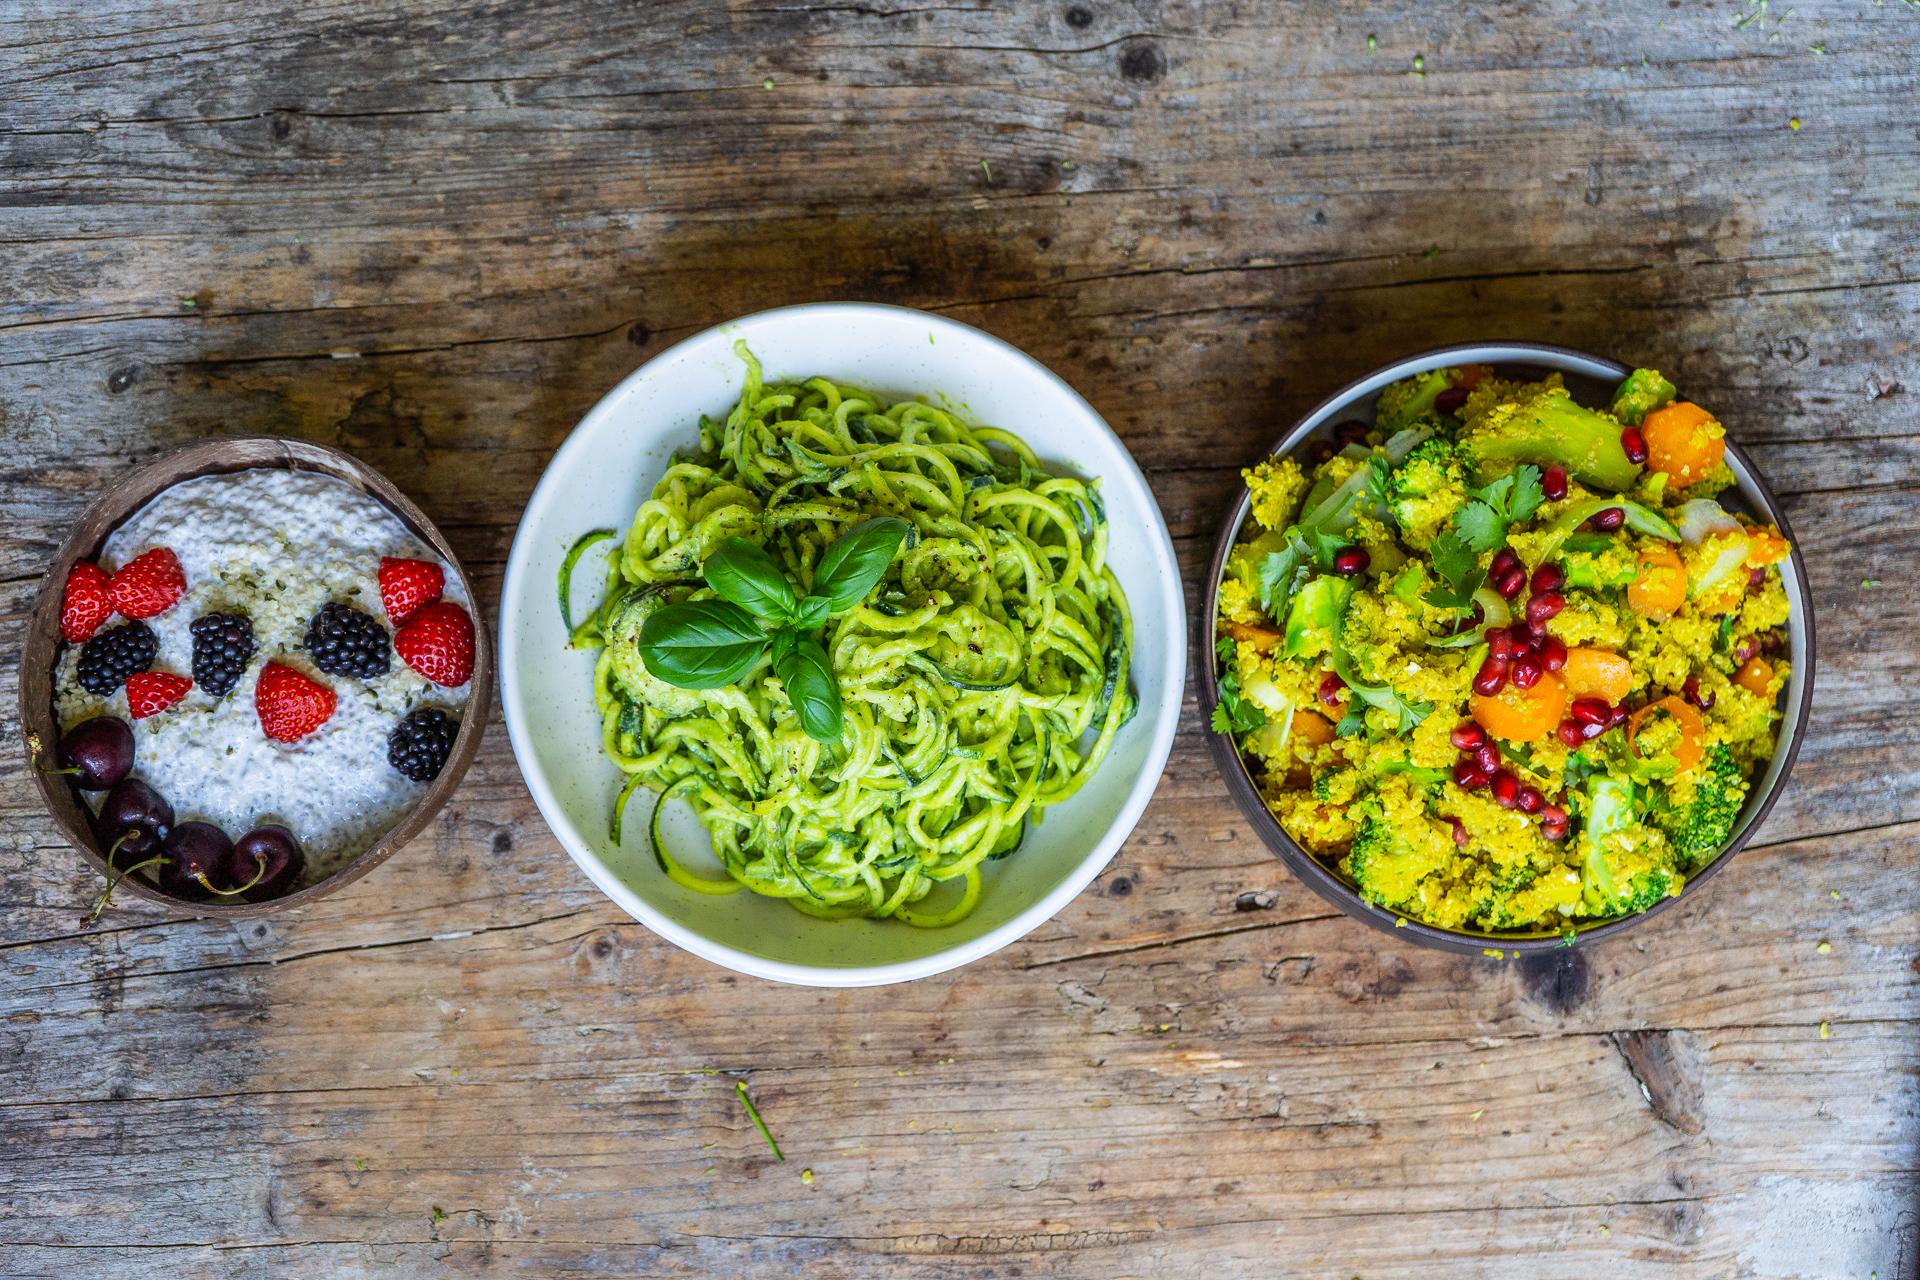 Ernährungsplan für 1 Tag - Gesundes Meal Prep lower Carb Mrs Flury